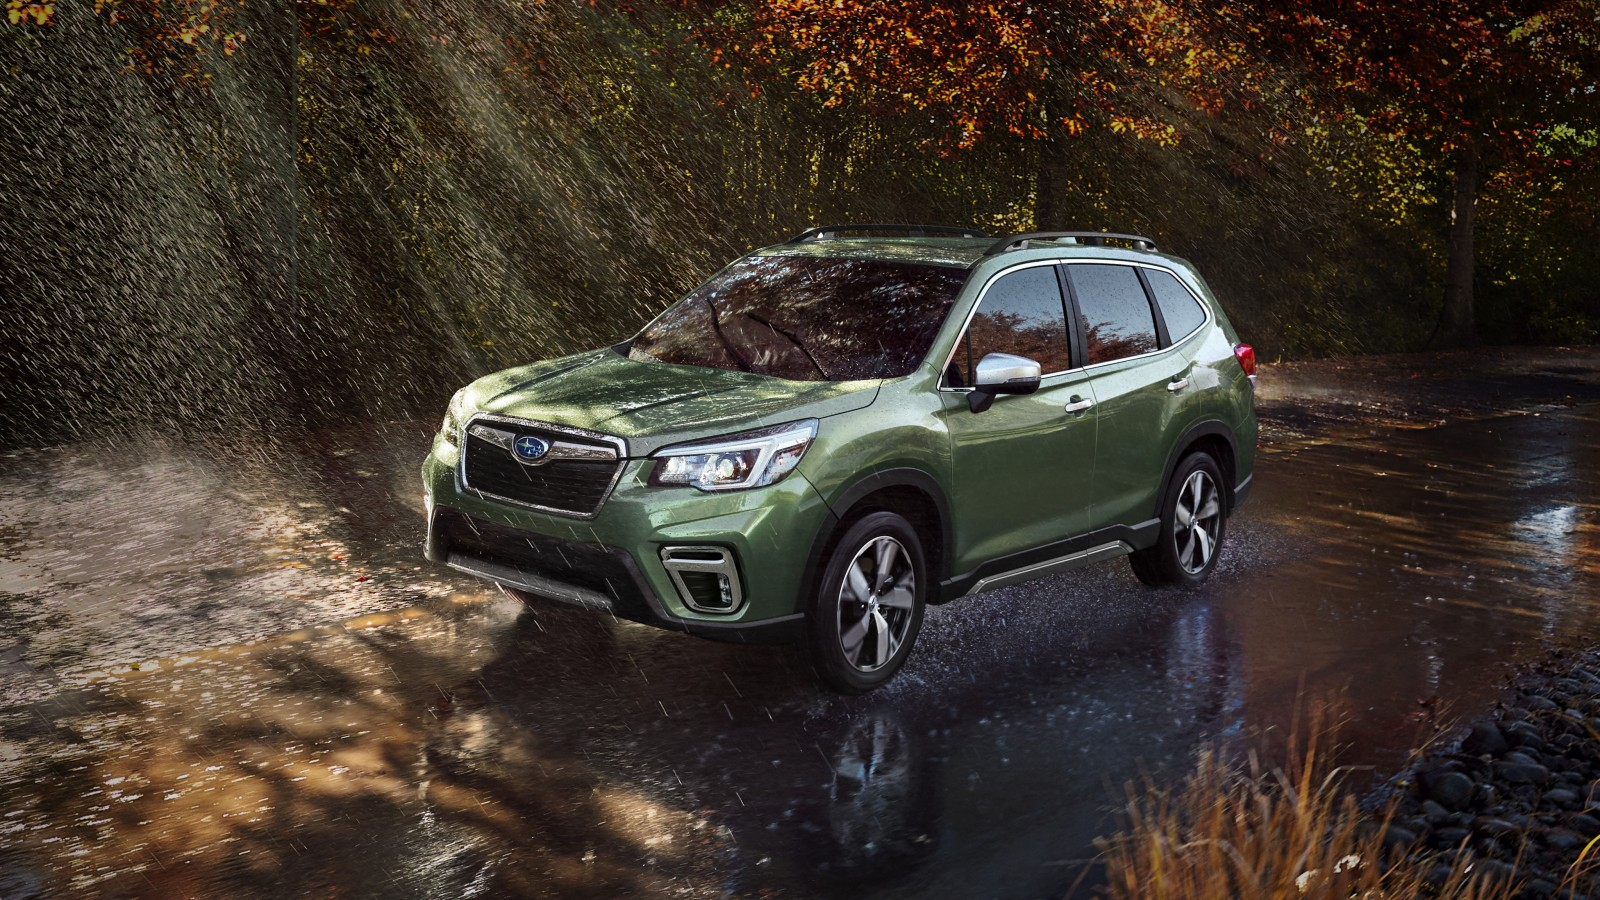 Forester Subaru 2019 >> 2019 Subaru Forester Touring 4K Wallpaper | HD Car Wallpapers | ID #10115